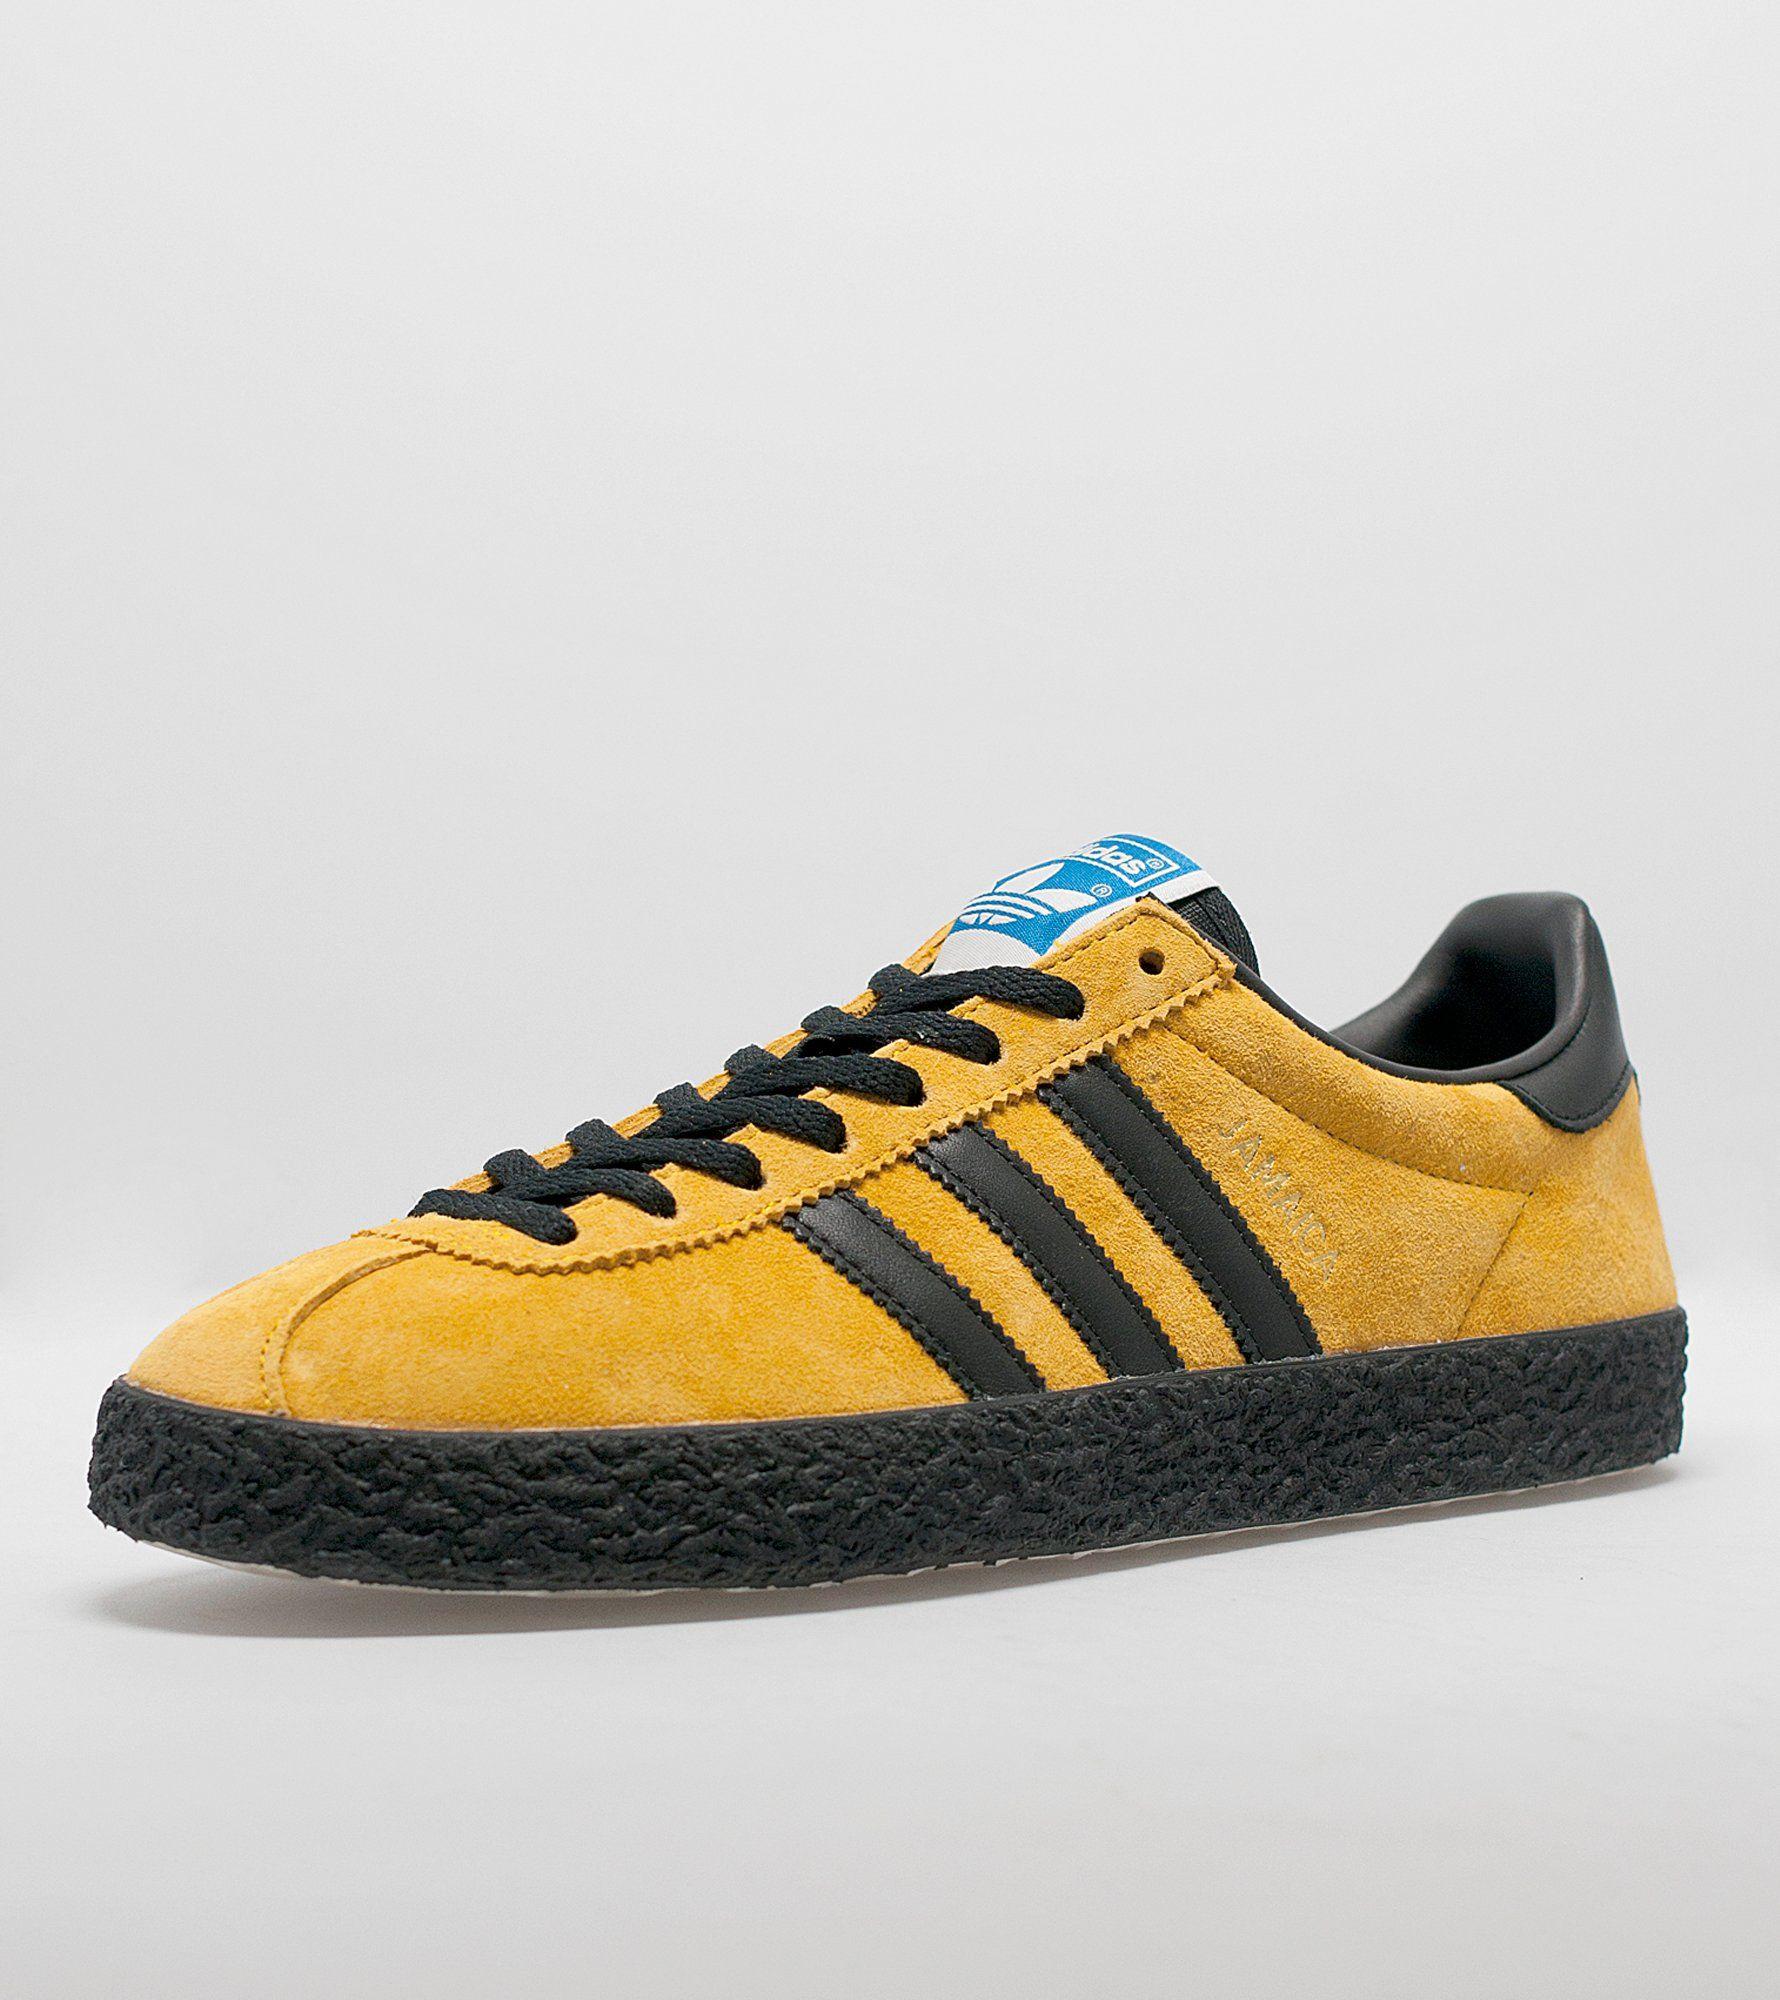 ¿Adidas Originals Jamaica og 'Island Series' tamaño?